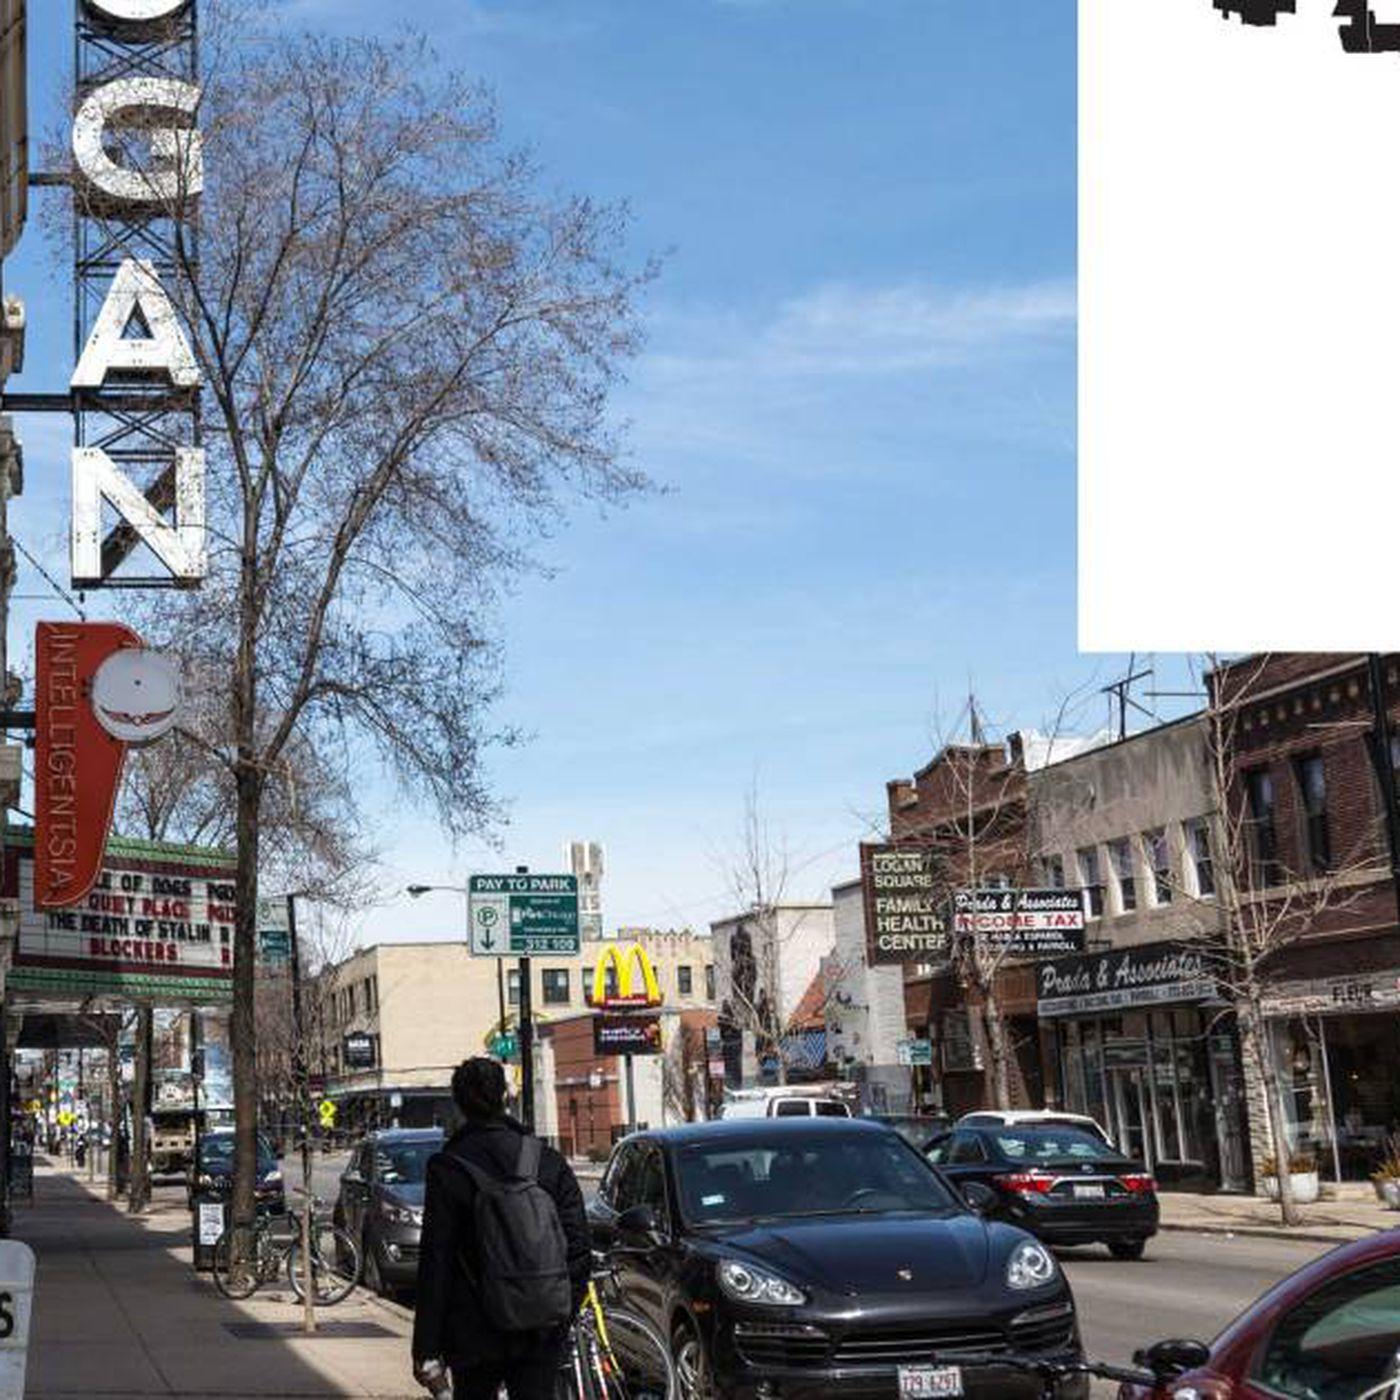 Hook up Chicago Heights Delaware dating online